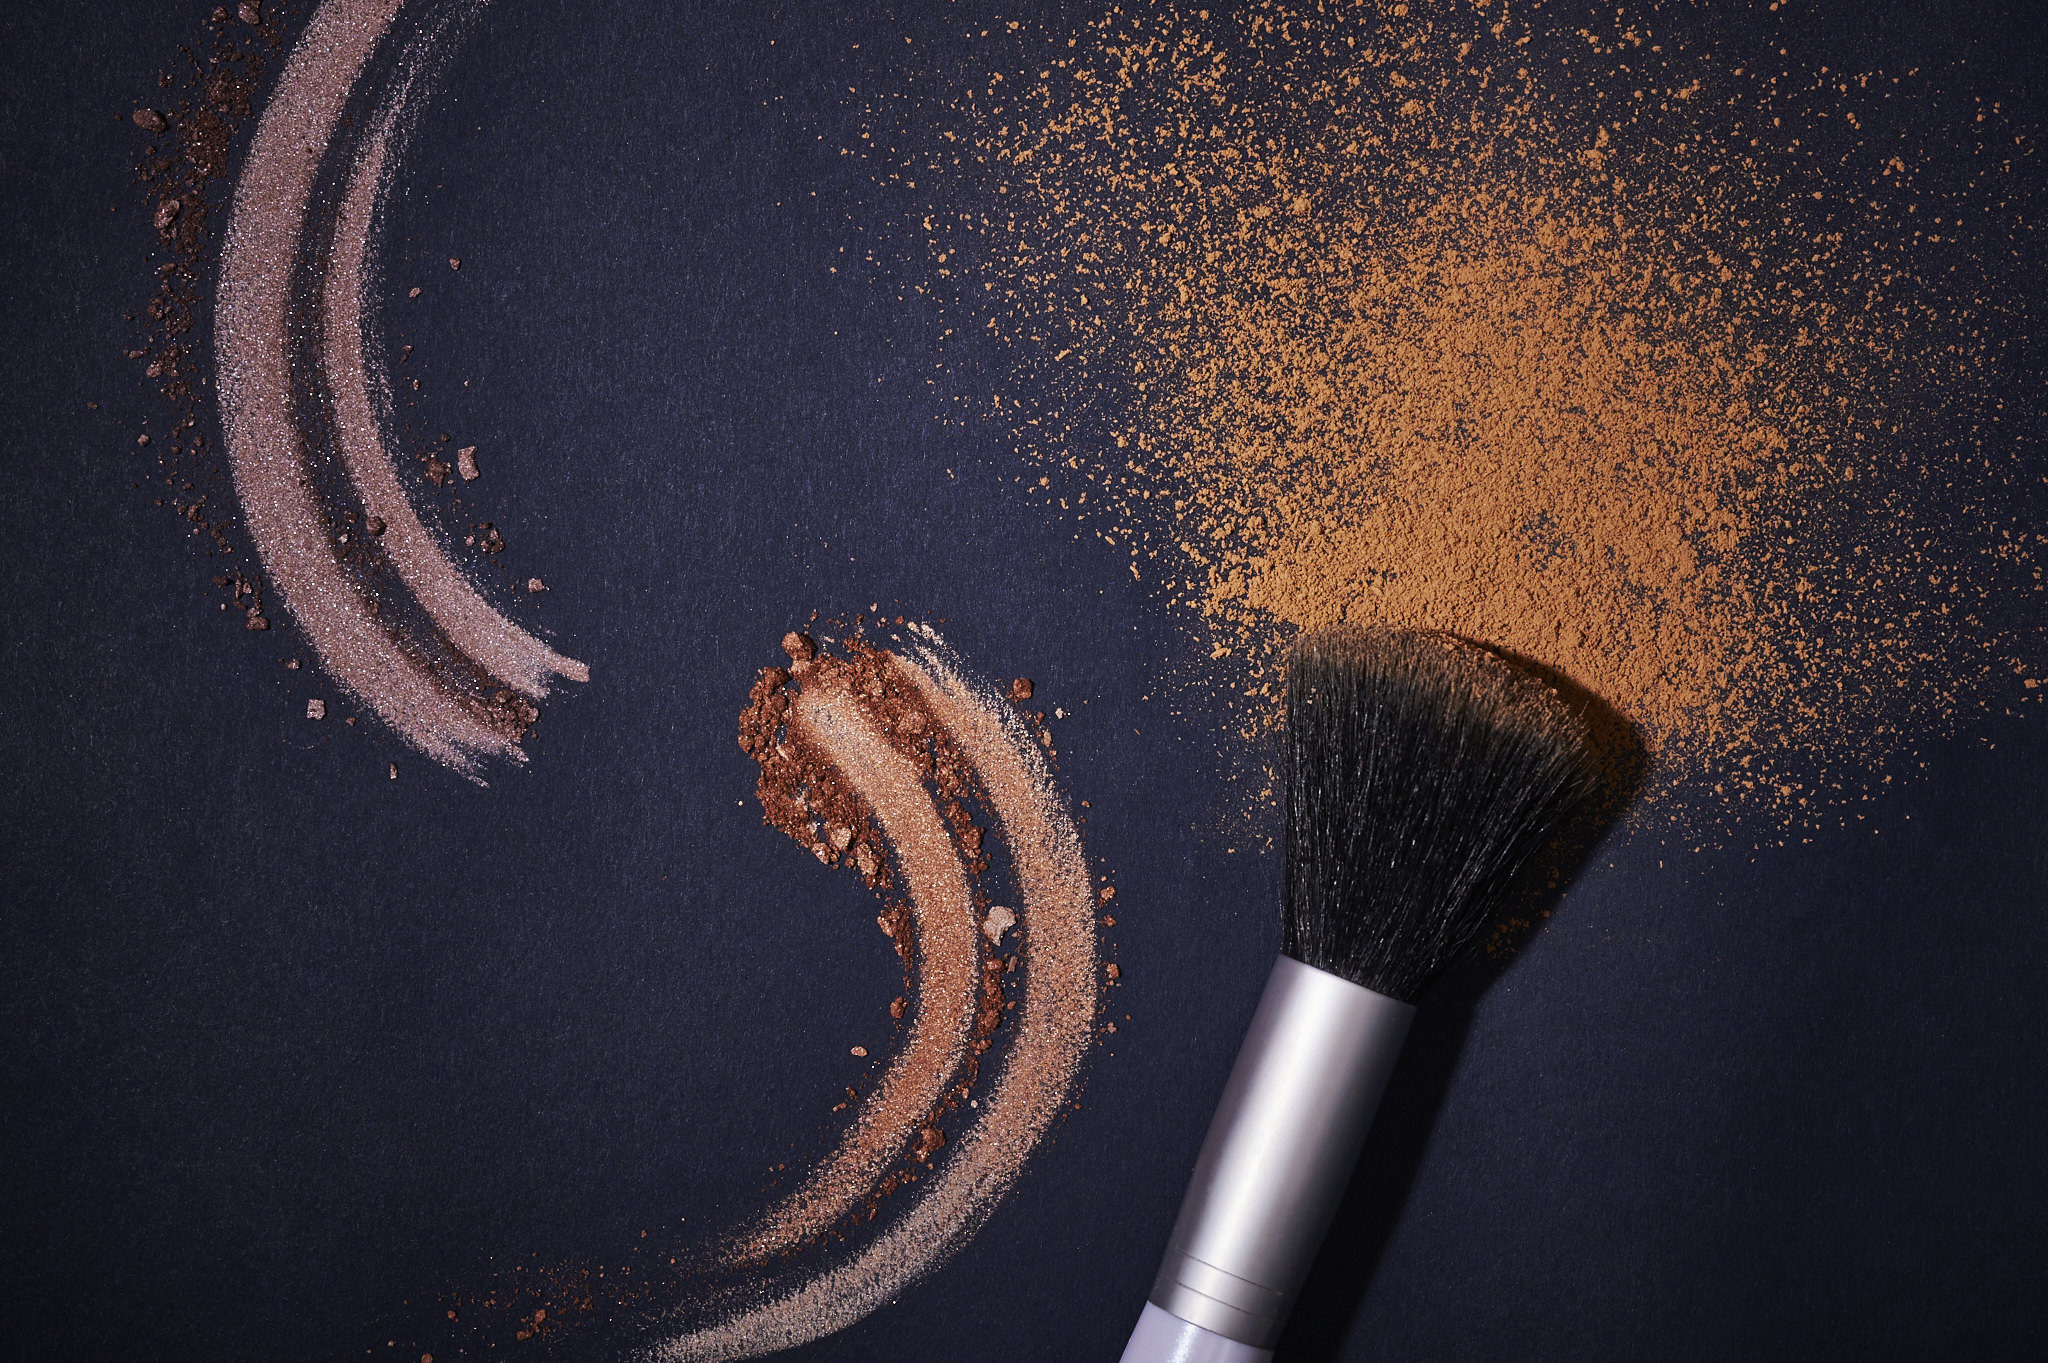 Space_Make_up.jpg